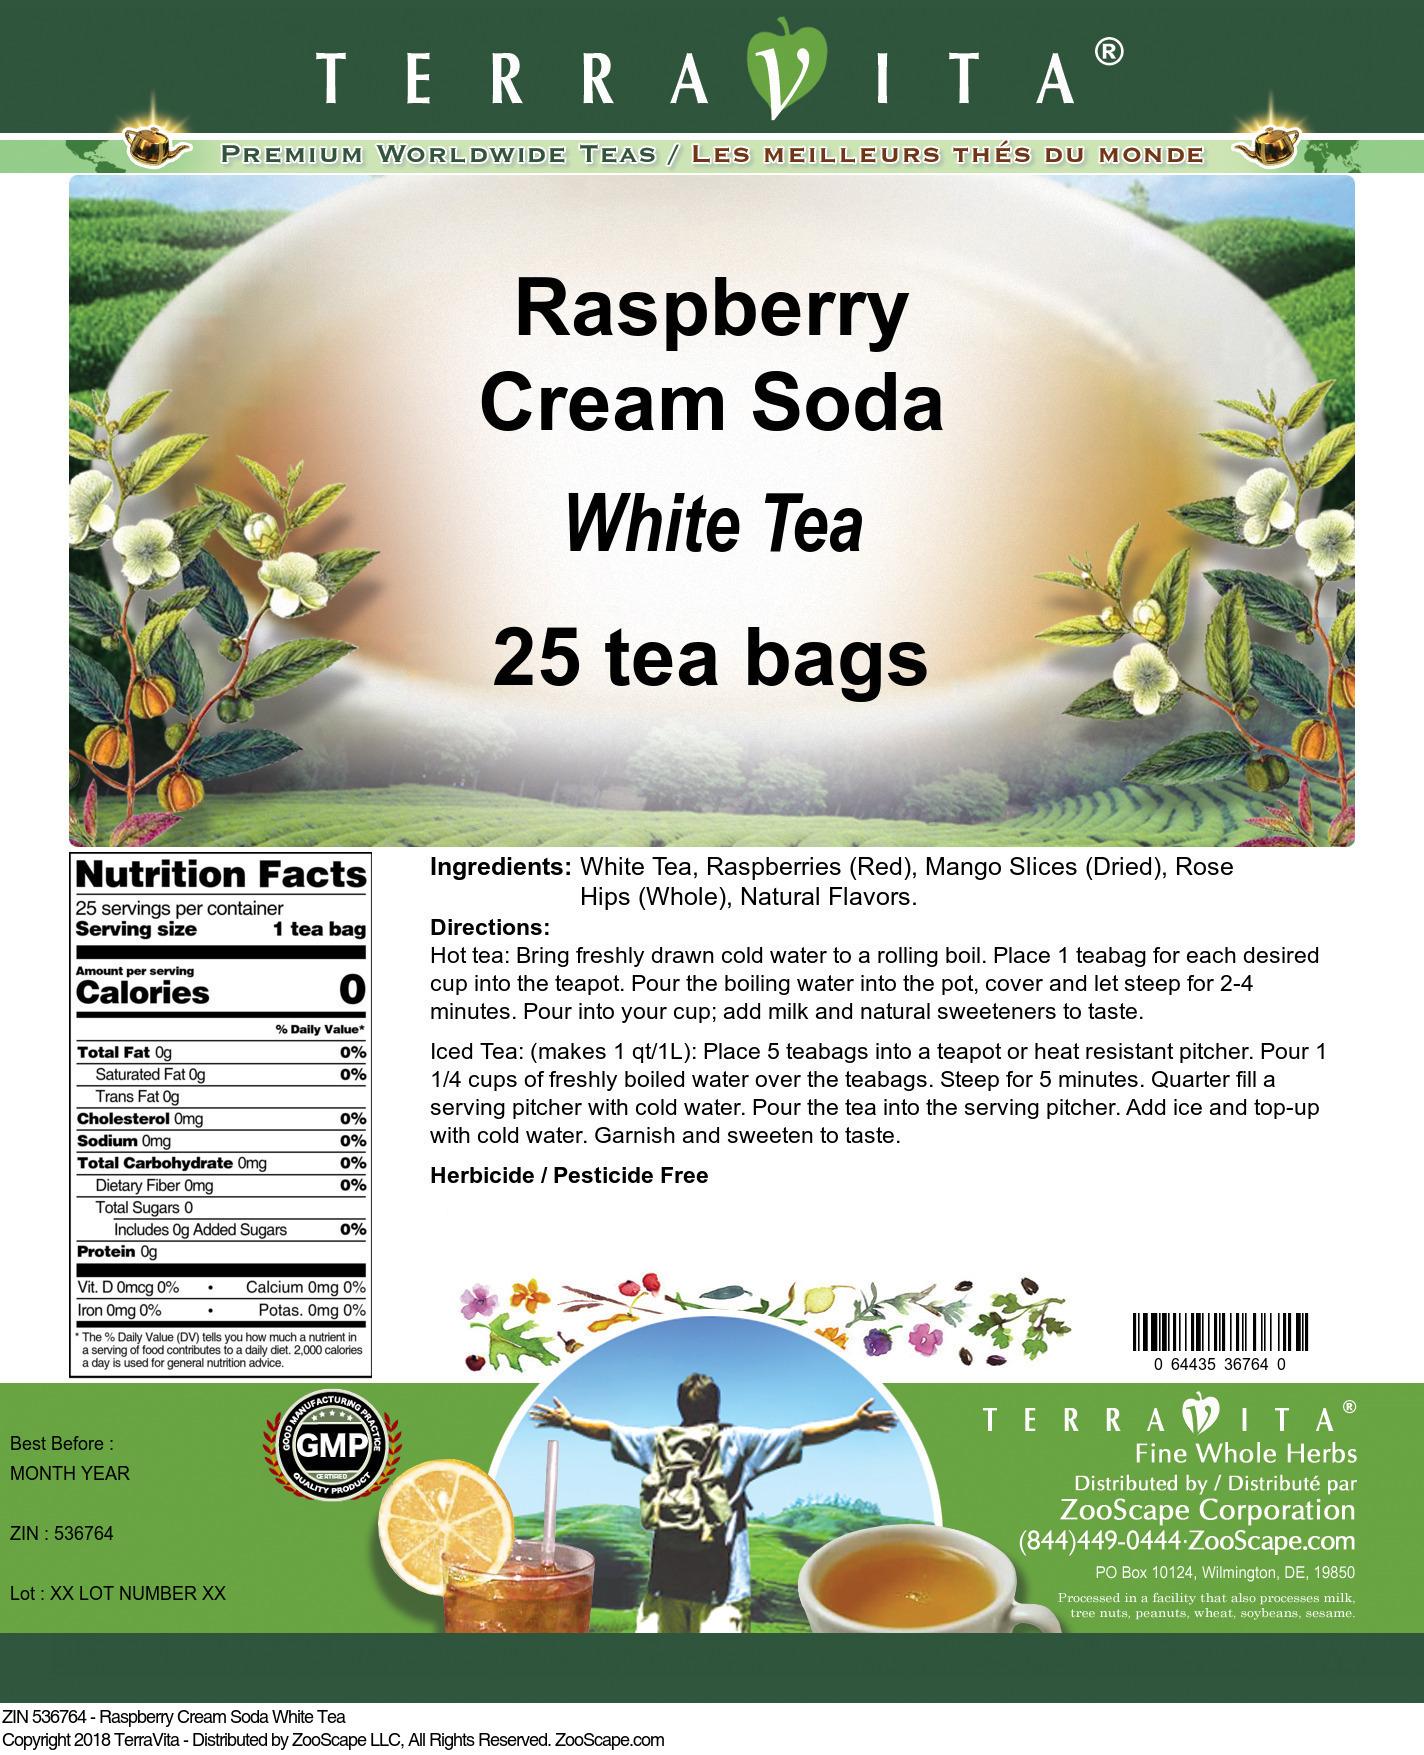 Raspberry Cream Soda White Tea